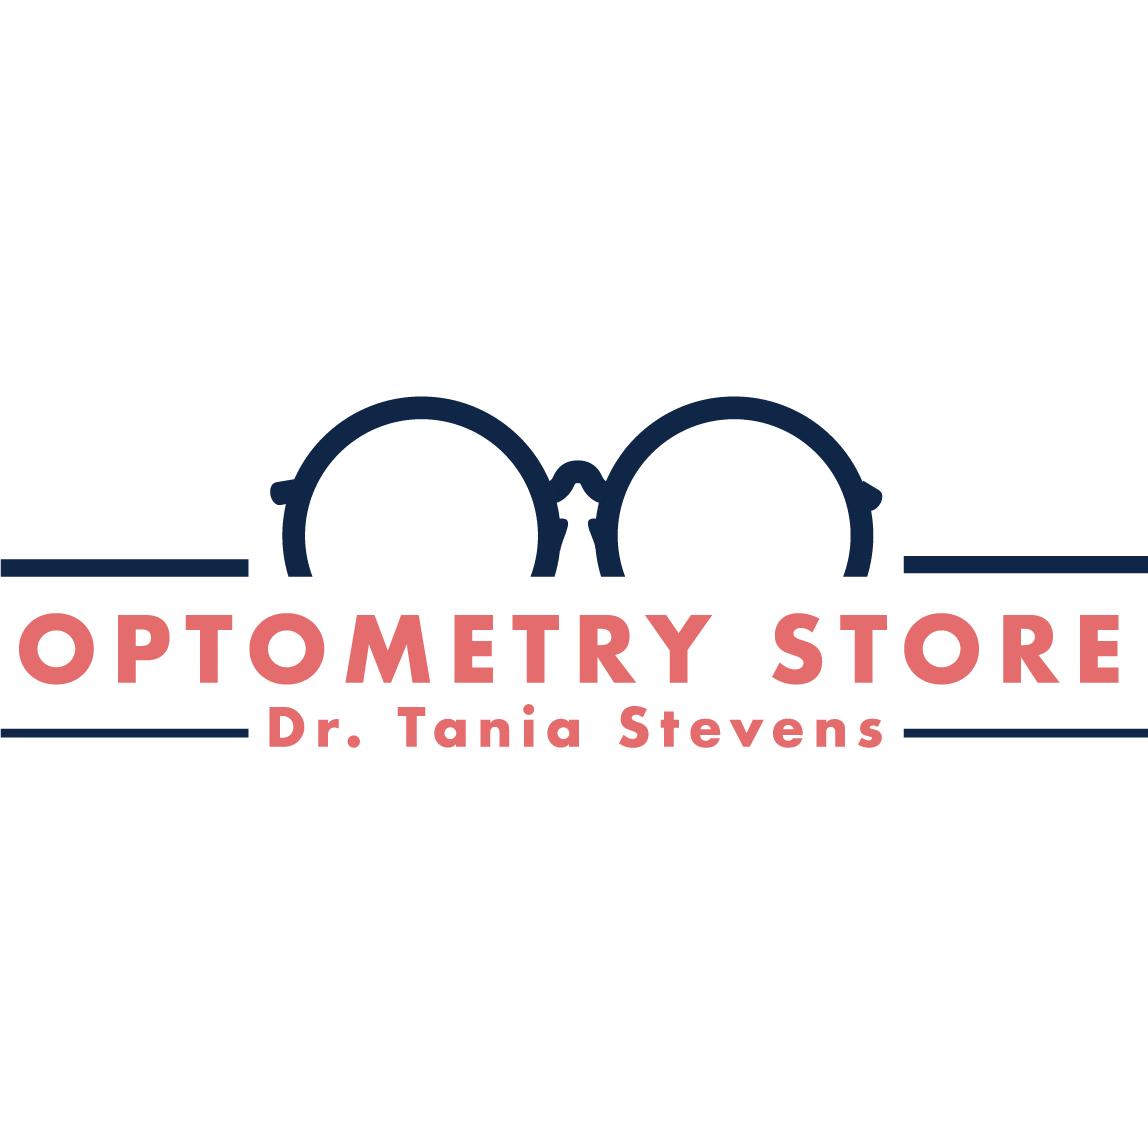 Optometry Store: Dr. Tania Stevens image 0